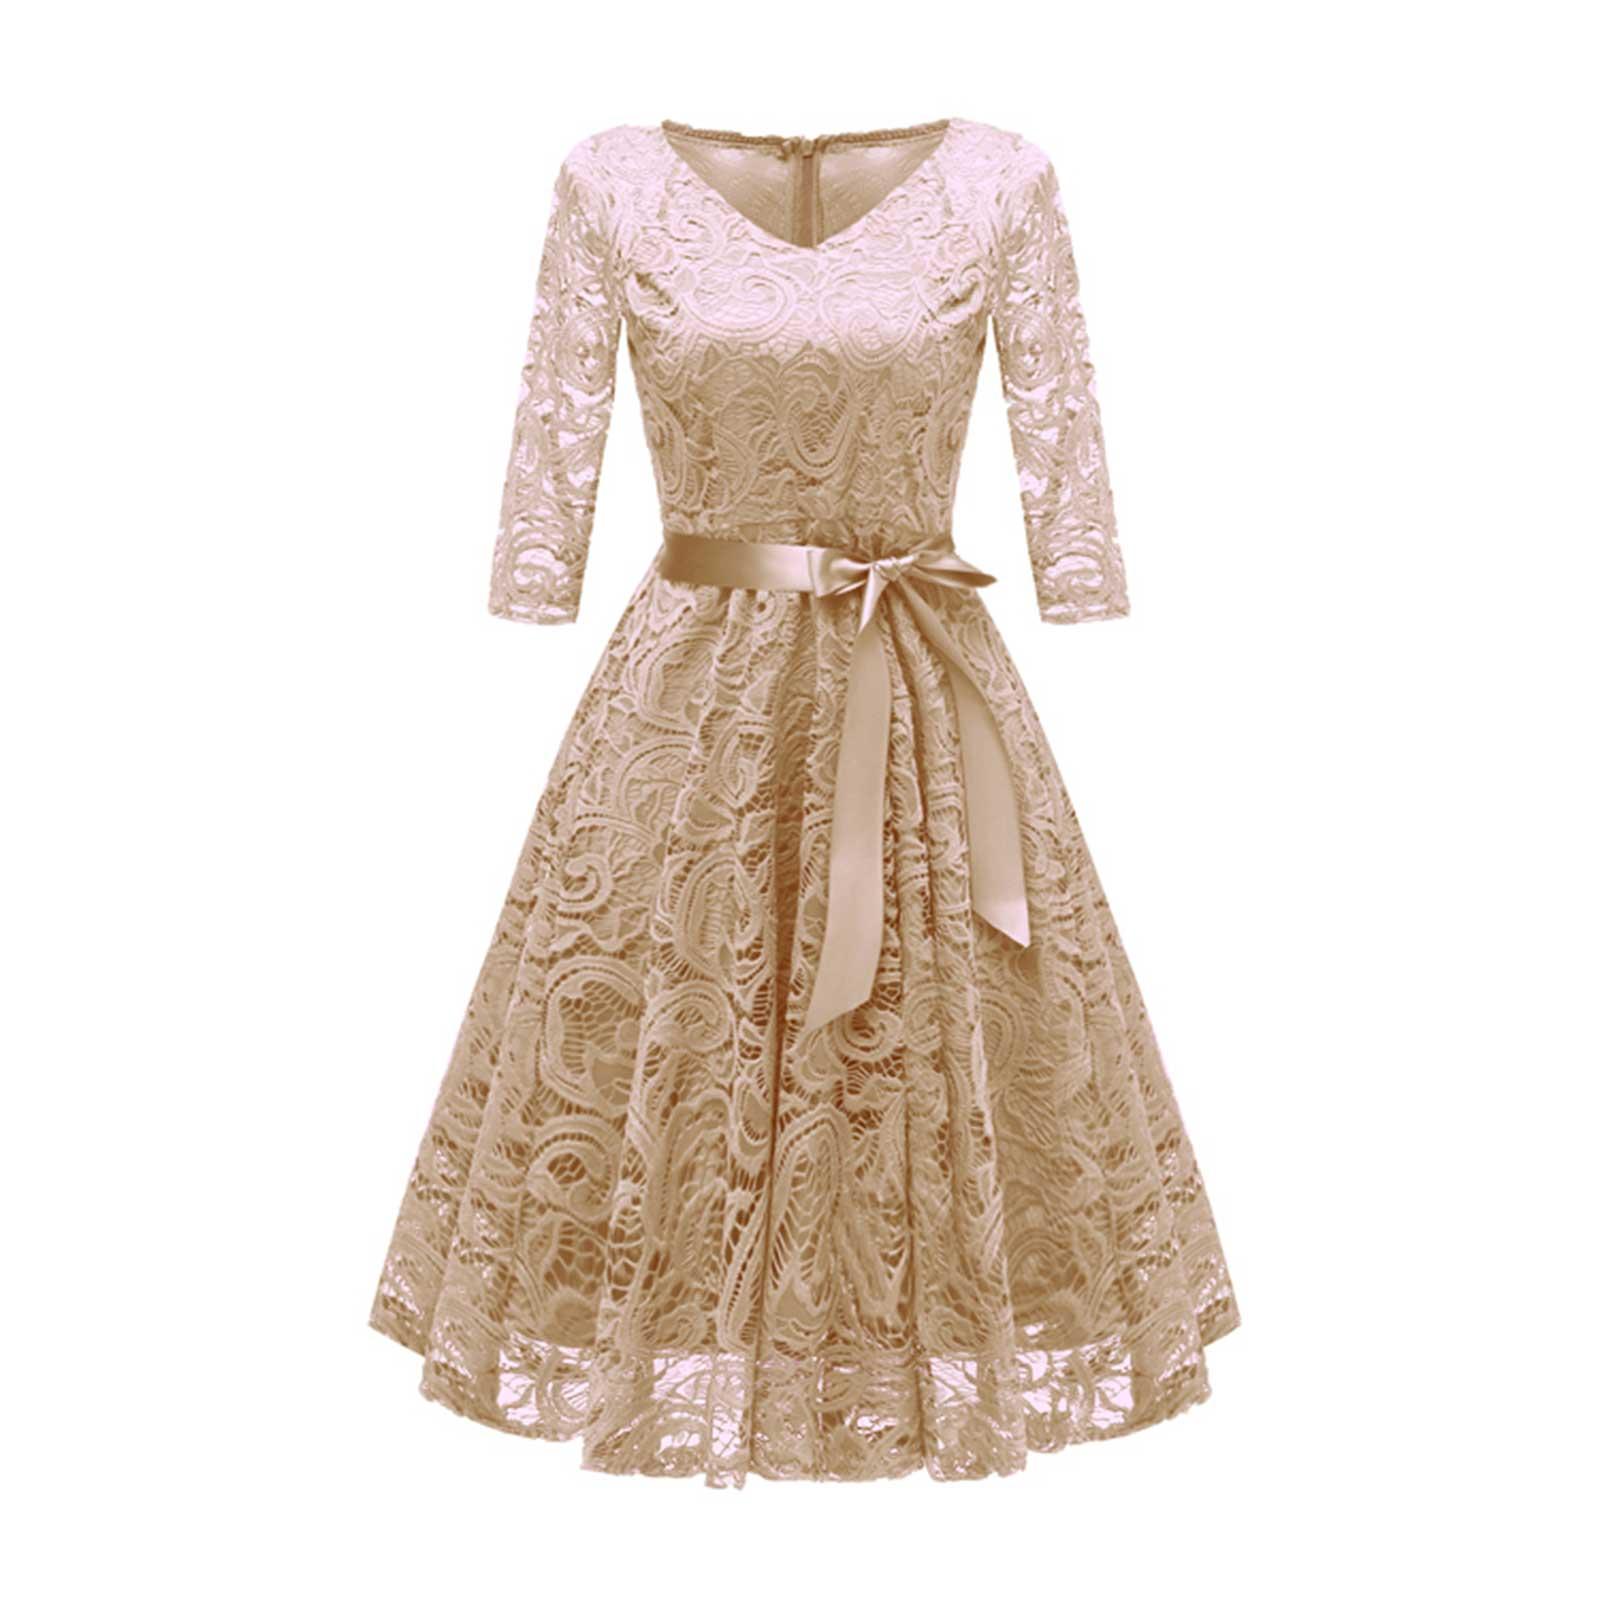 acbe9dd68f Floral Lace 3/4 Sleeve Wedding Bridesmaid Evening Midi A Line Dress ...